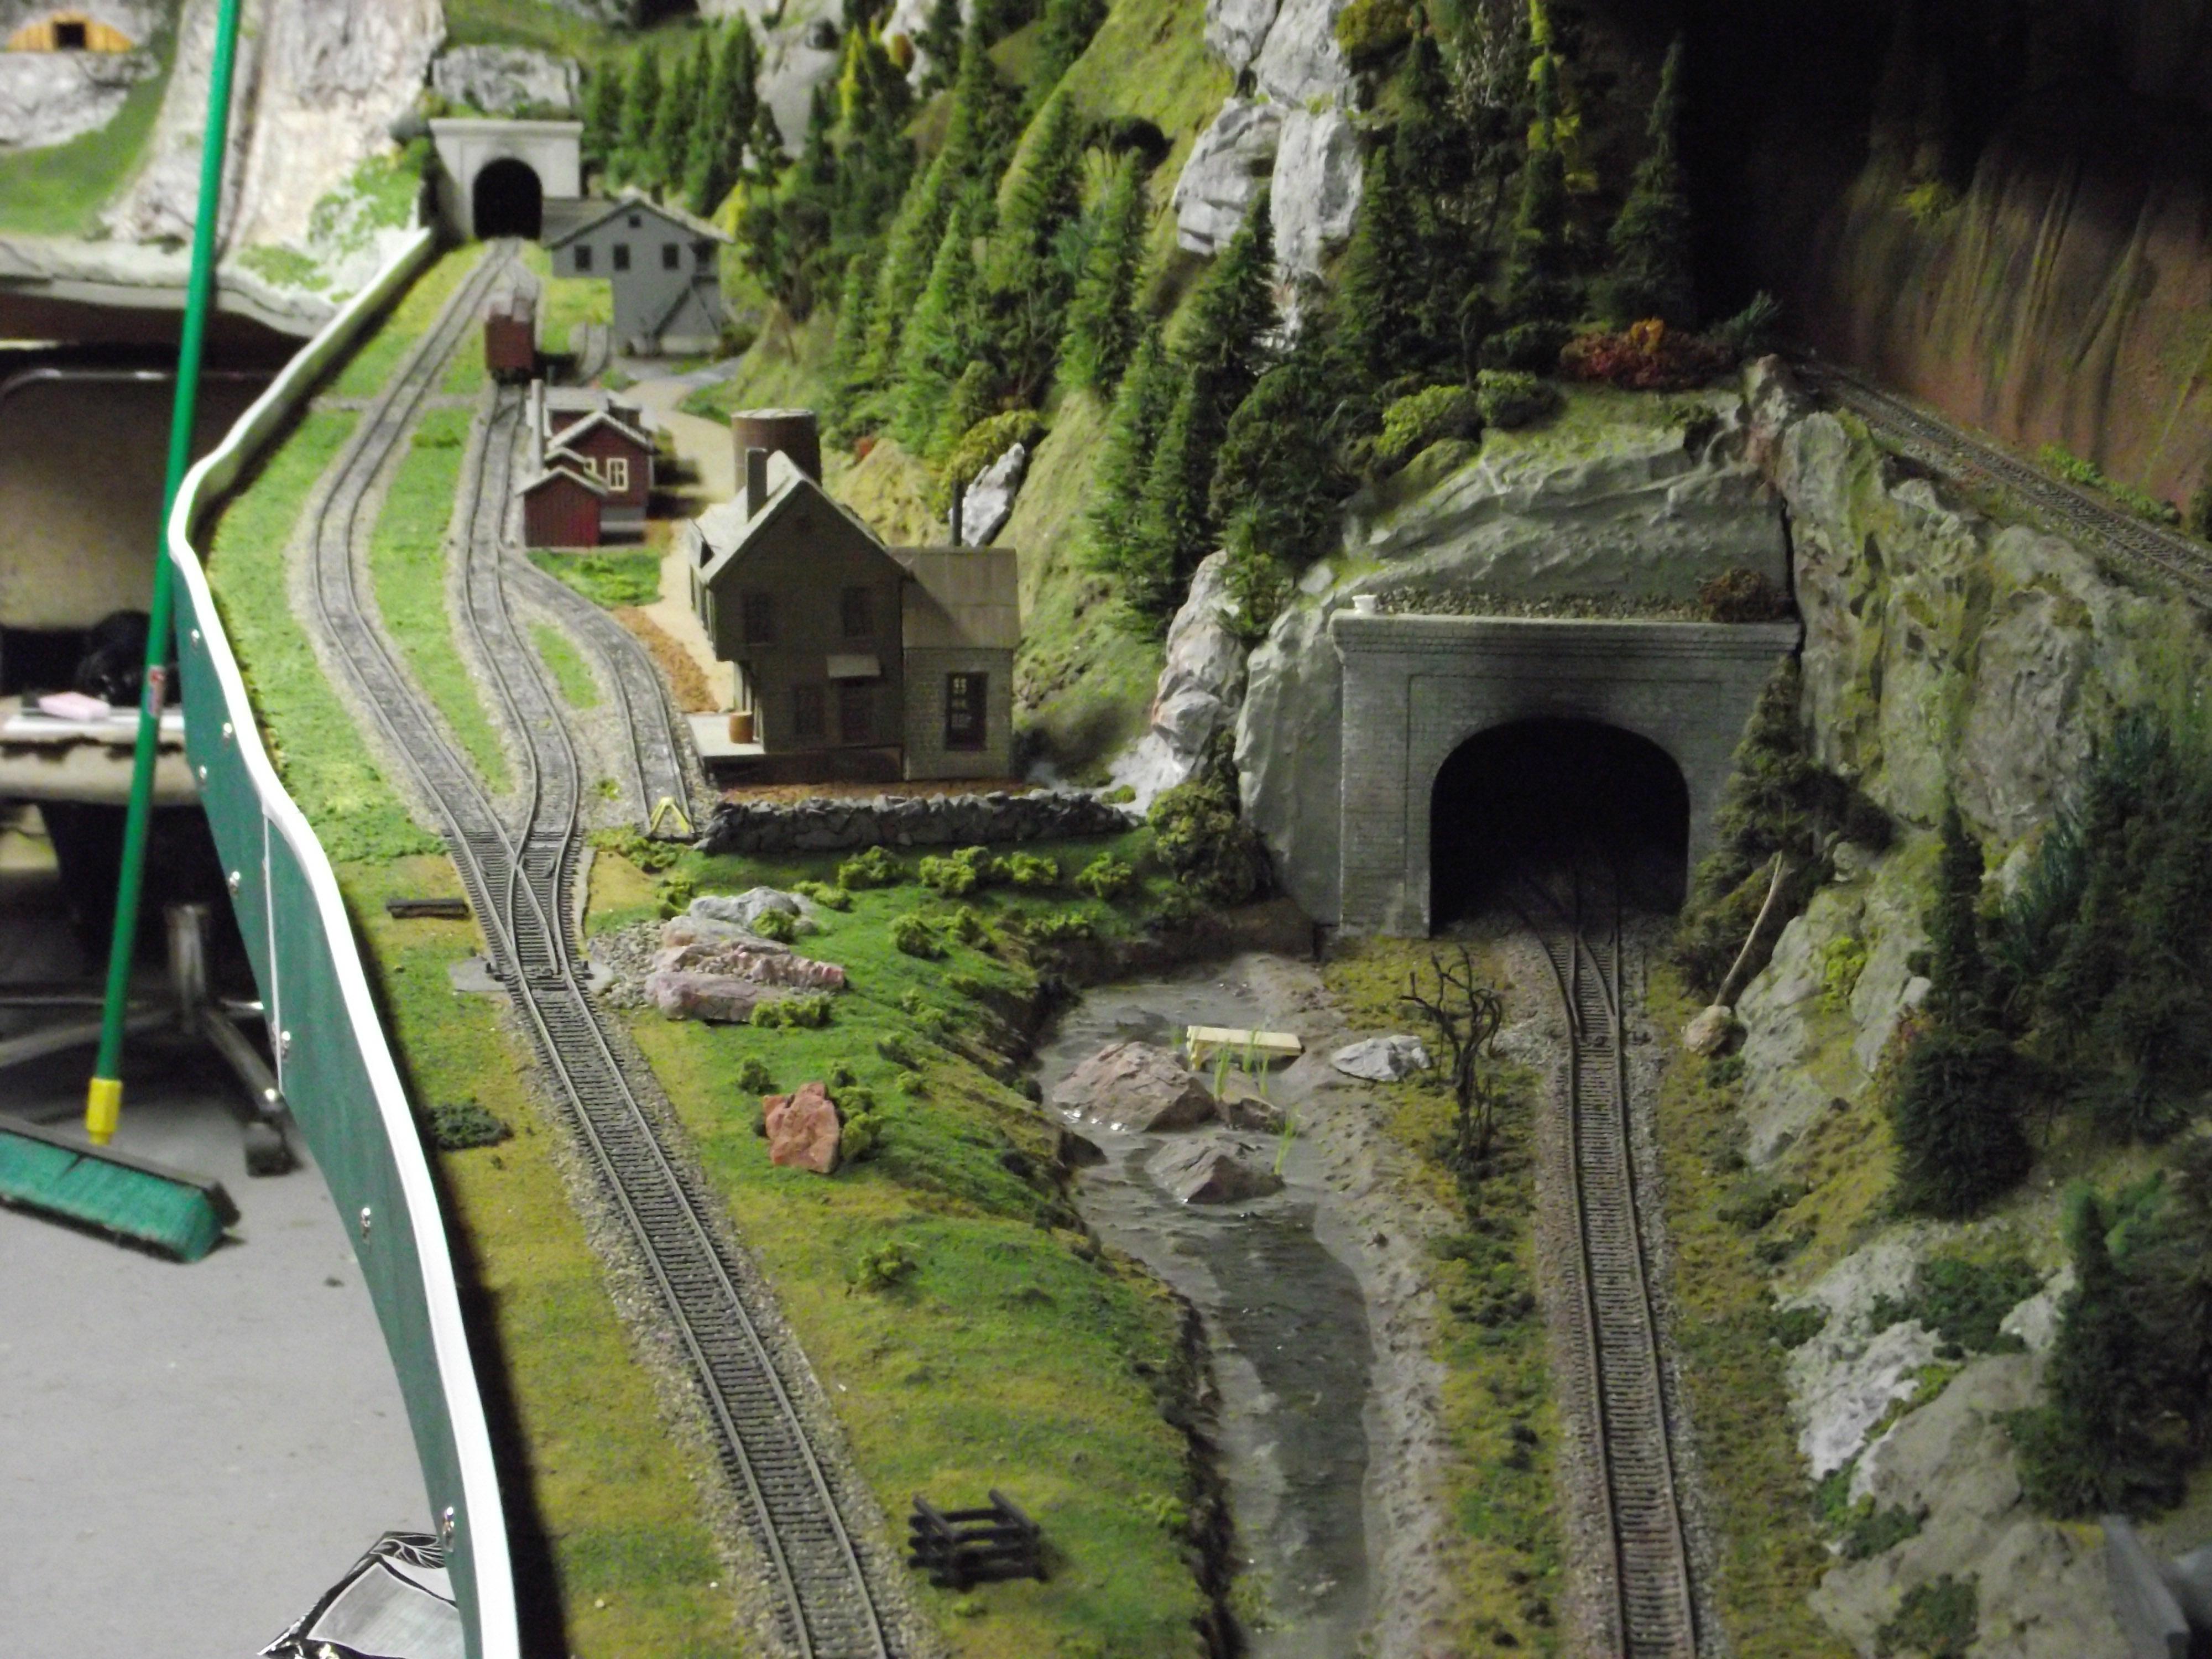 Lakeshore Model Railroaders Association